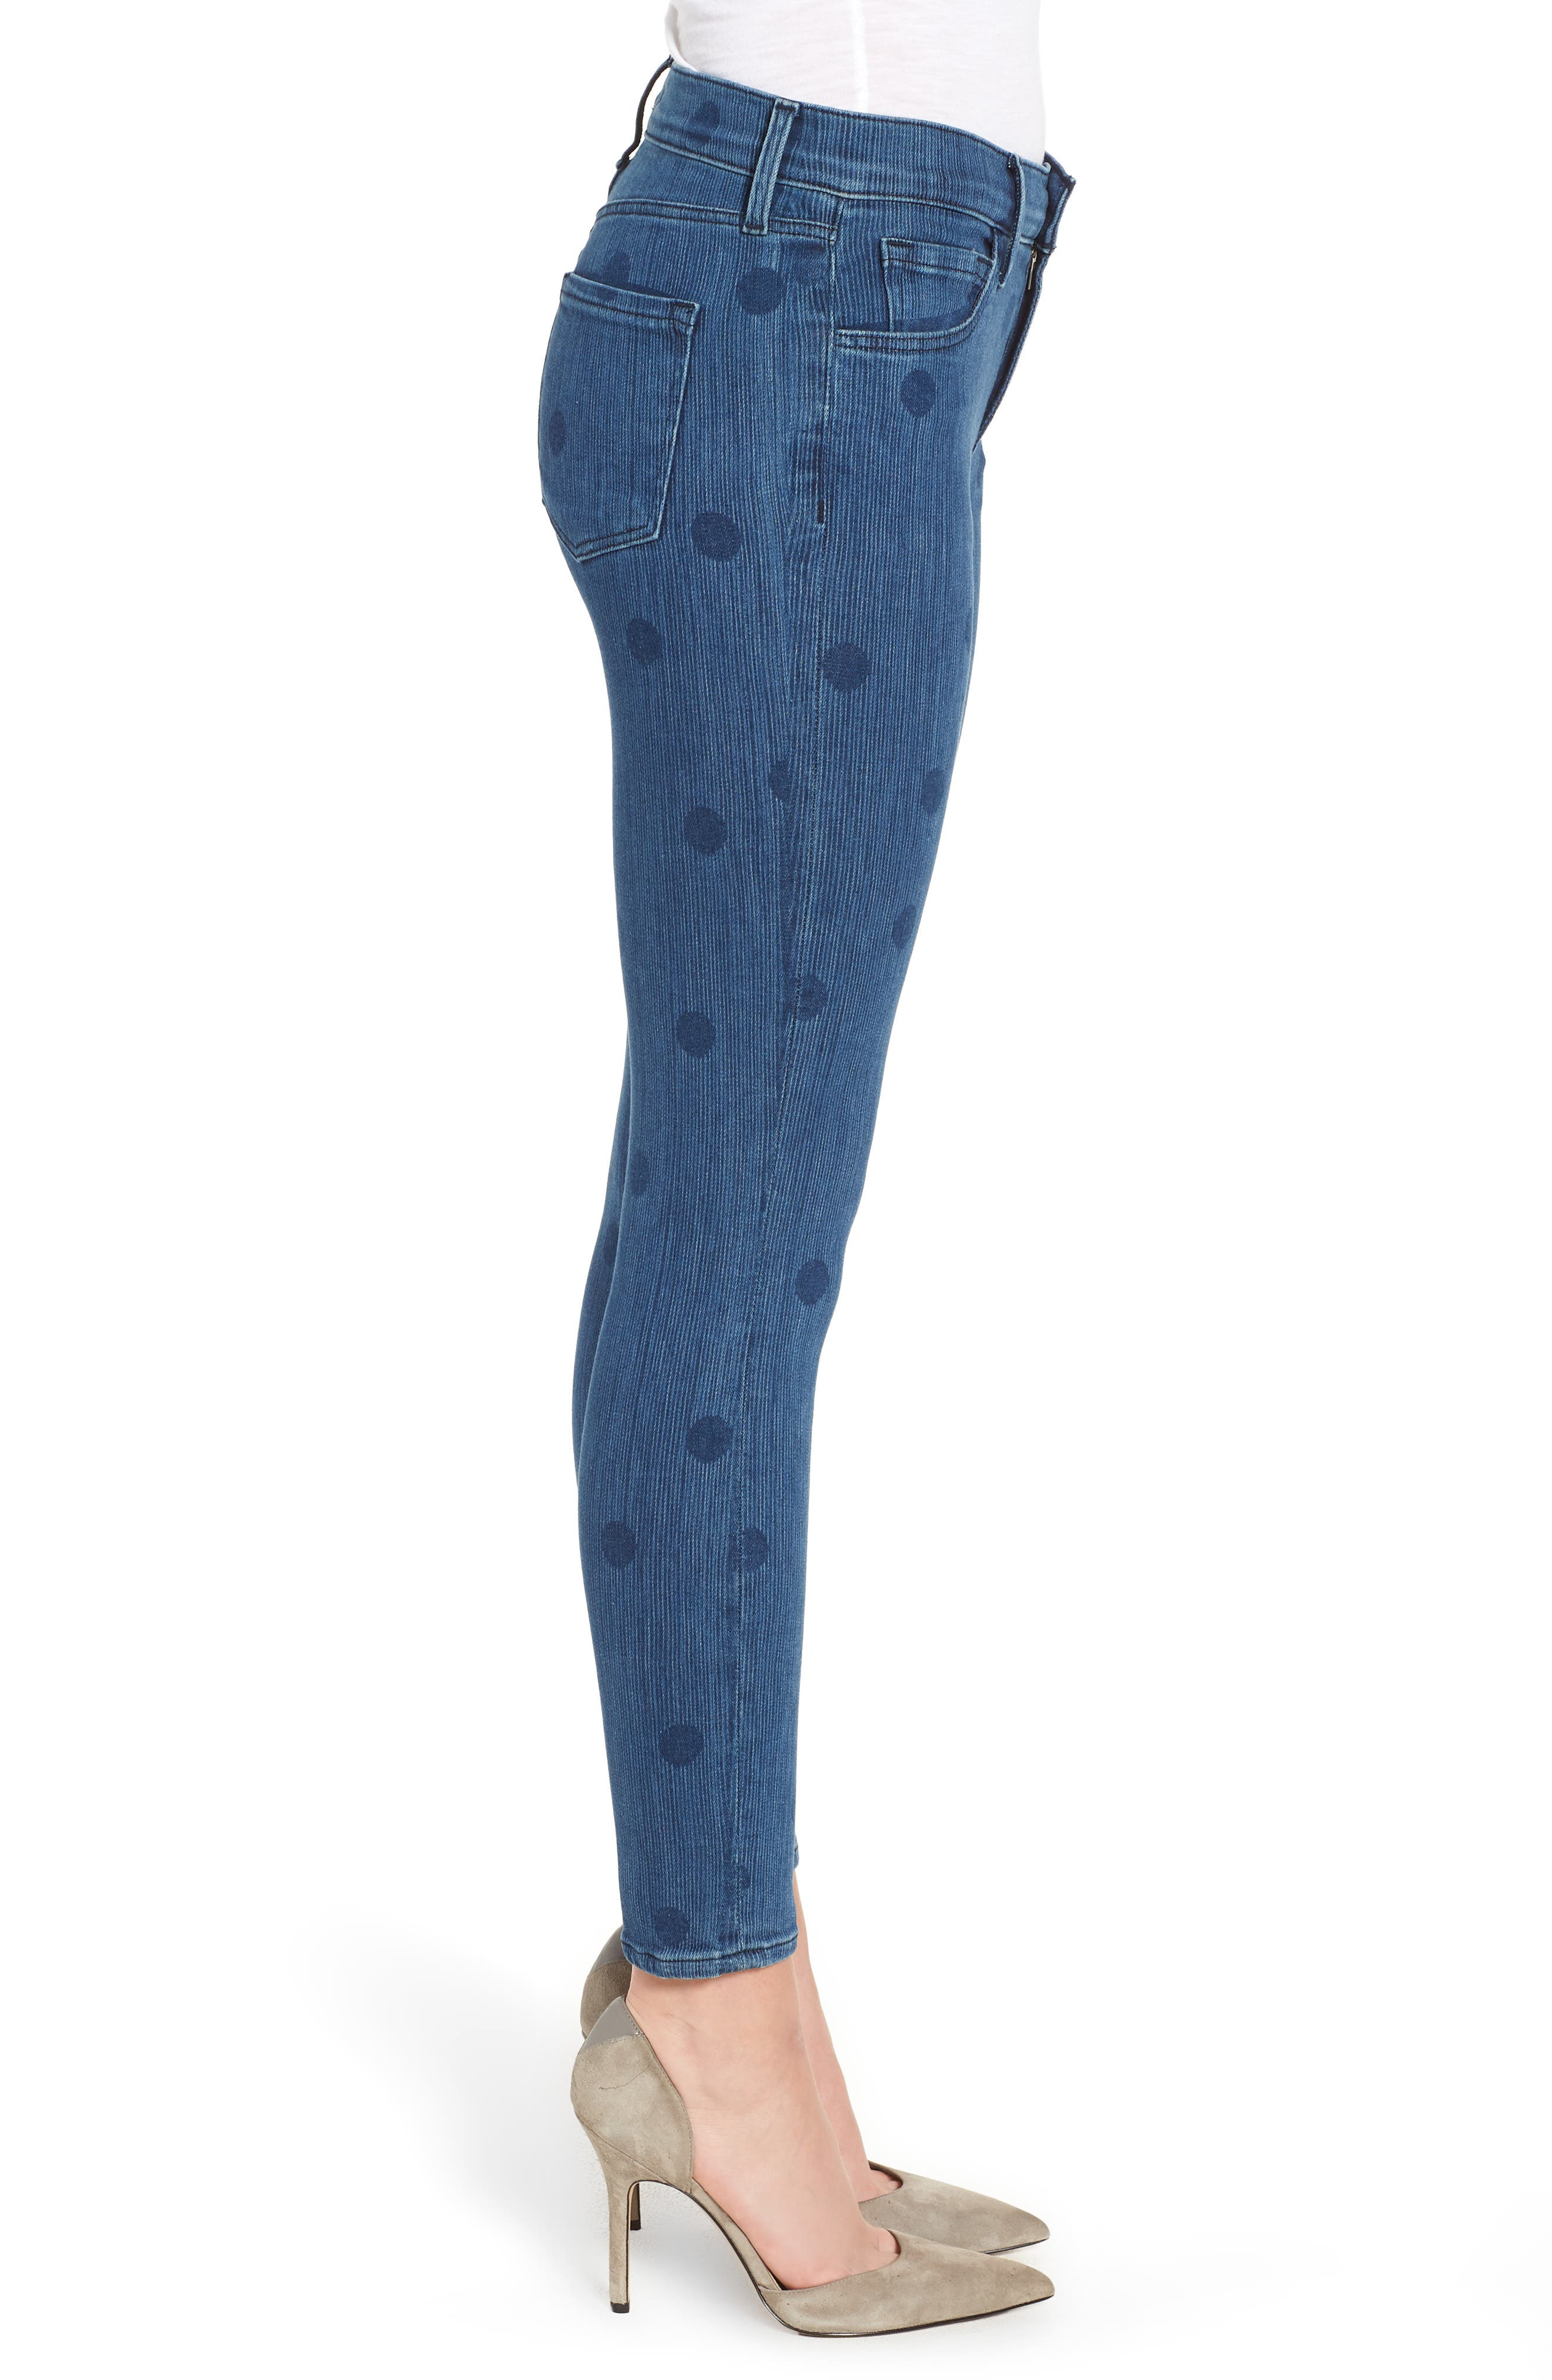 835 Capri Skinny Jeans,                             Alternate thumbnail 3, color,                             400